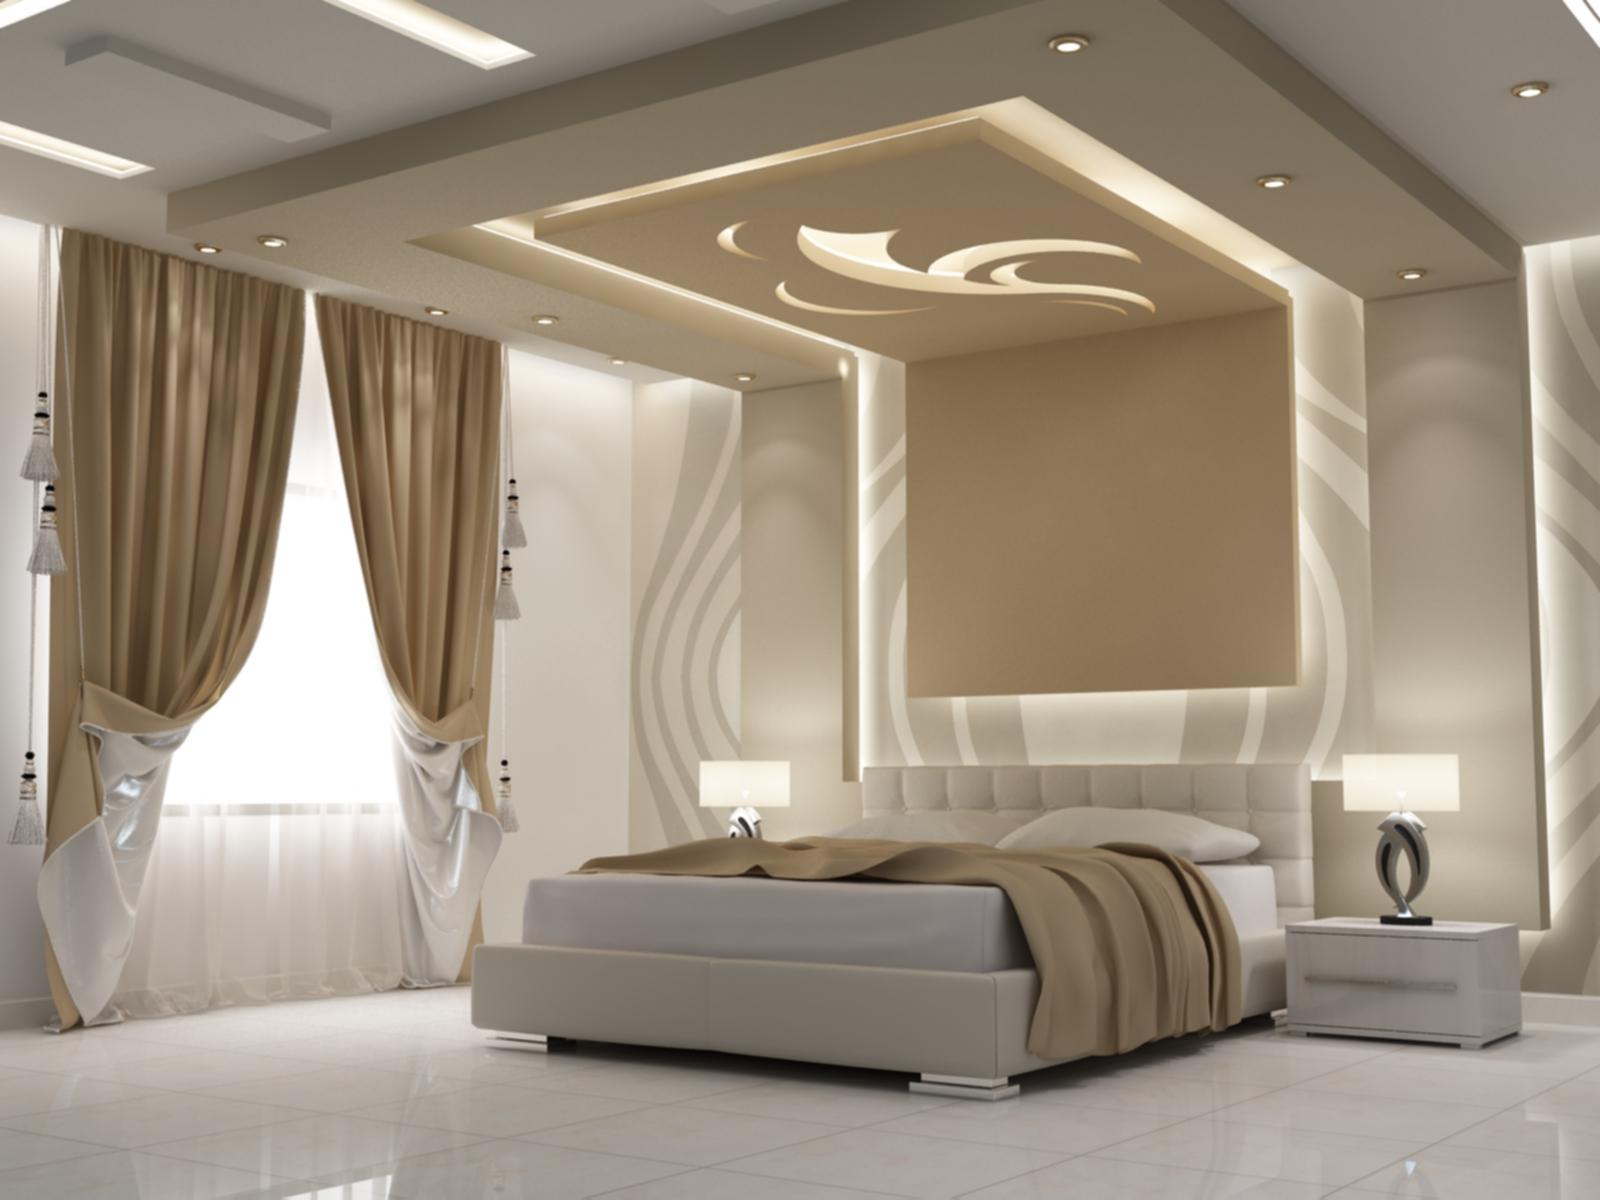 بالصور غرف نوم للعرسان 2019 , اجمل تصاميم غرف نوم عرايس جدد 2165 8